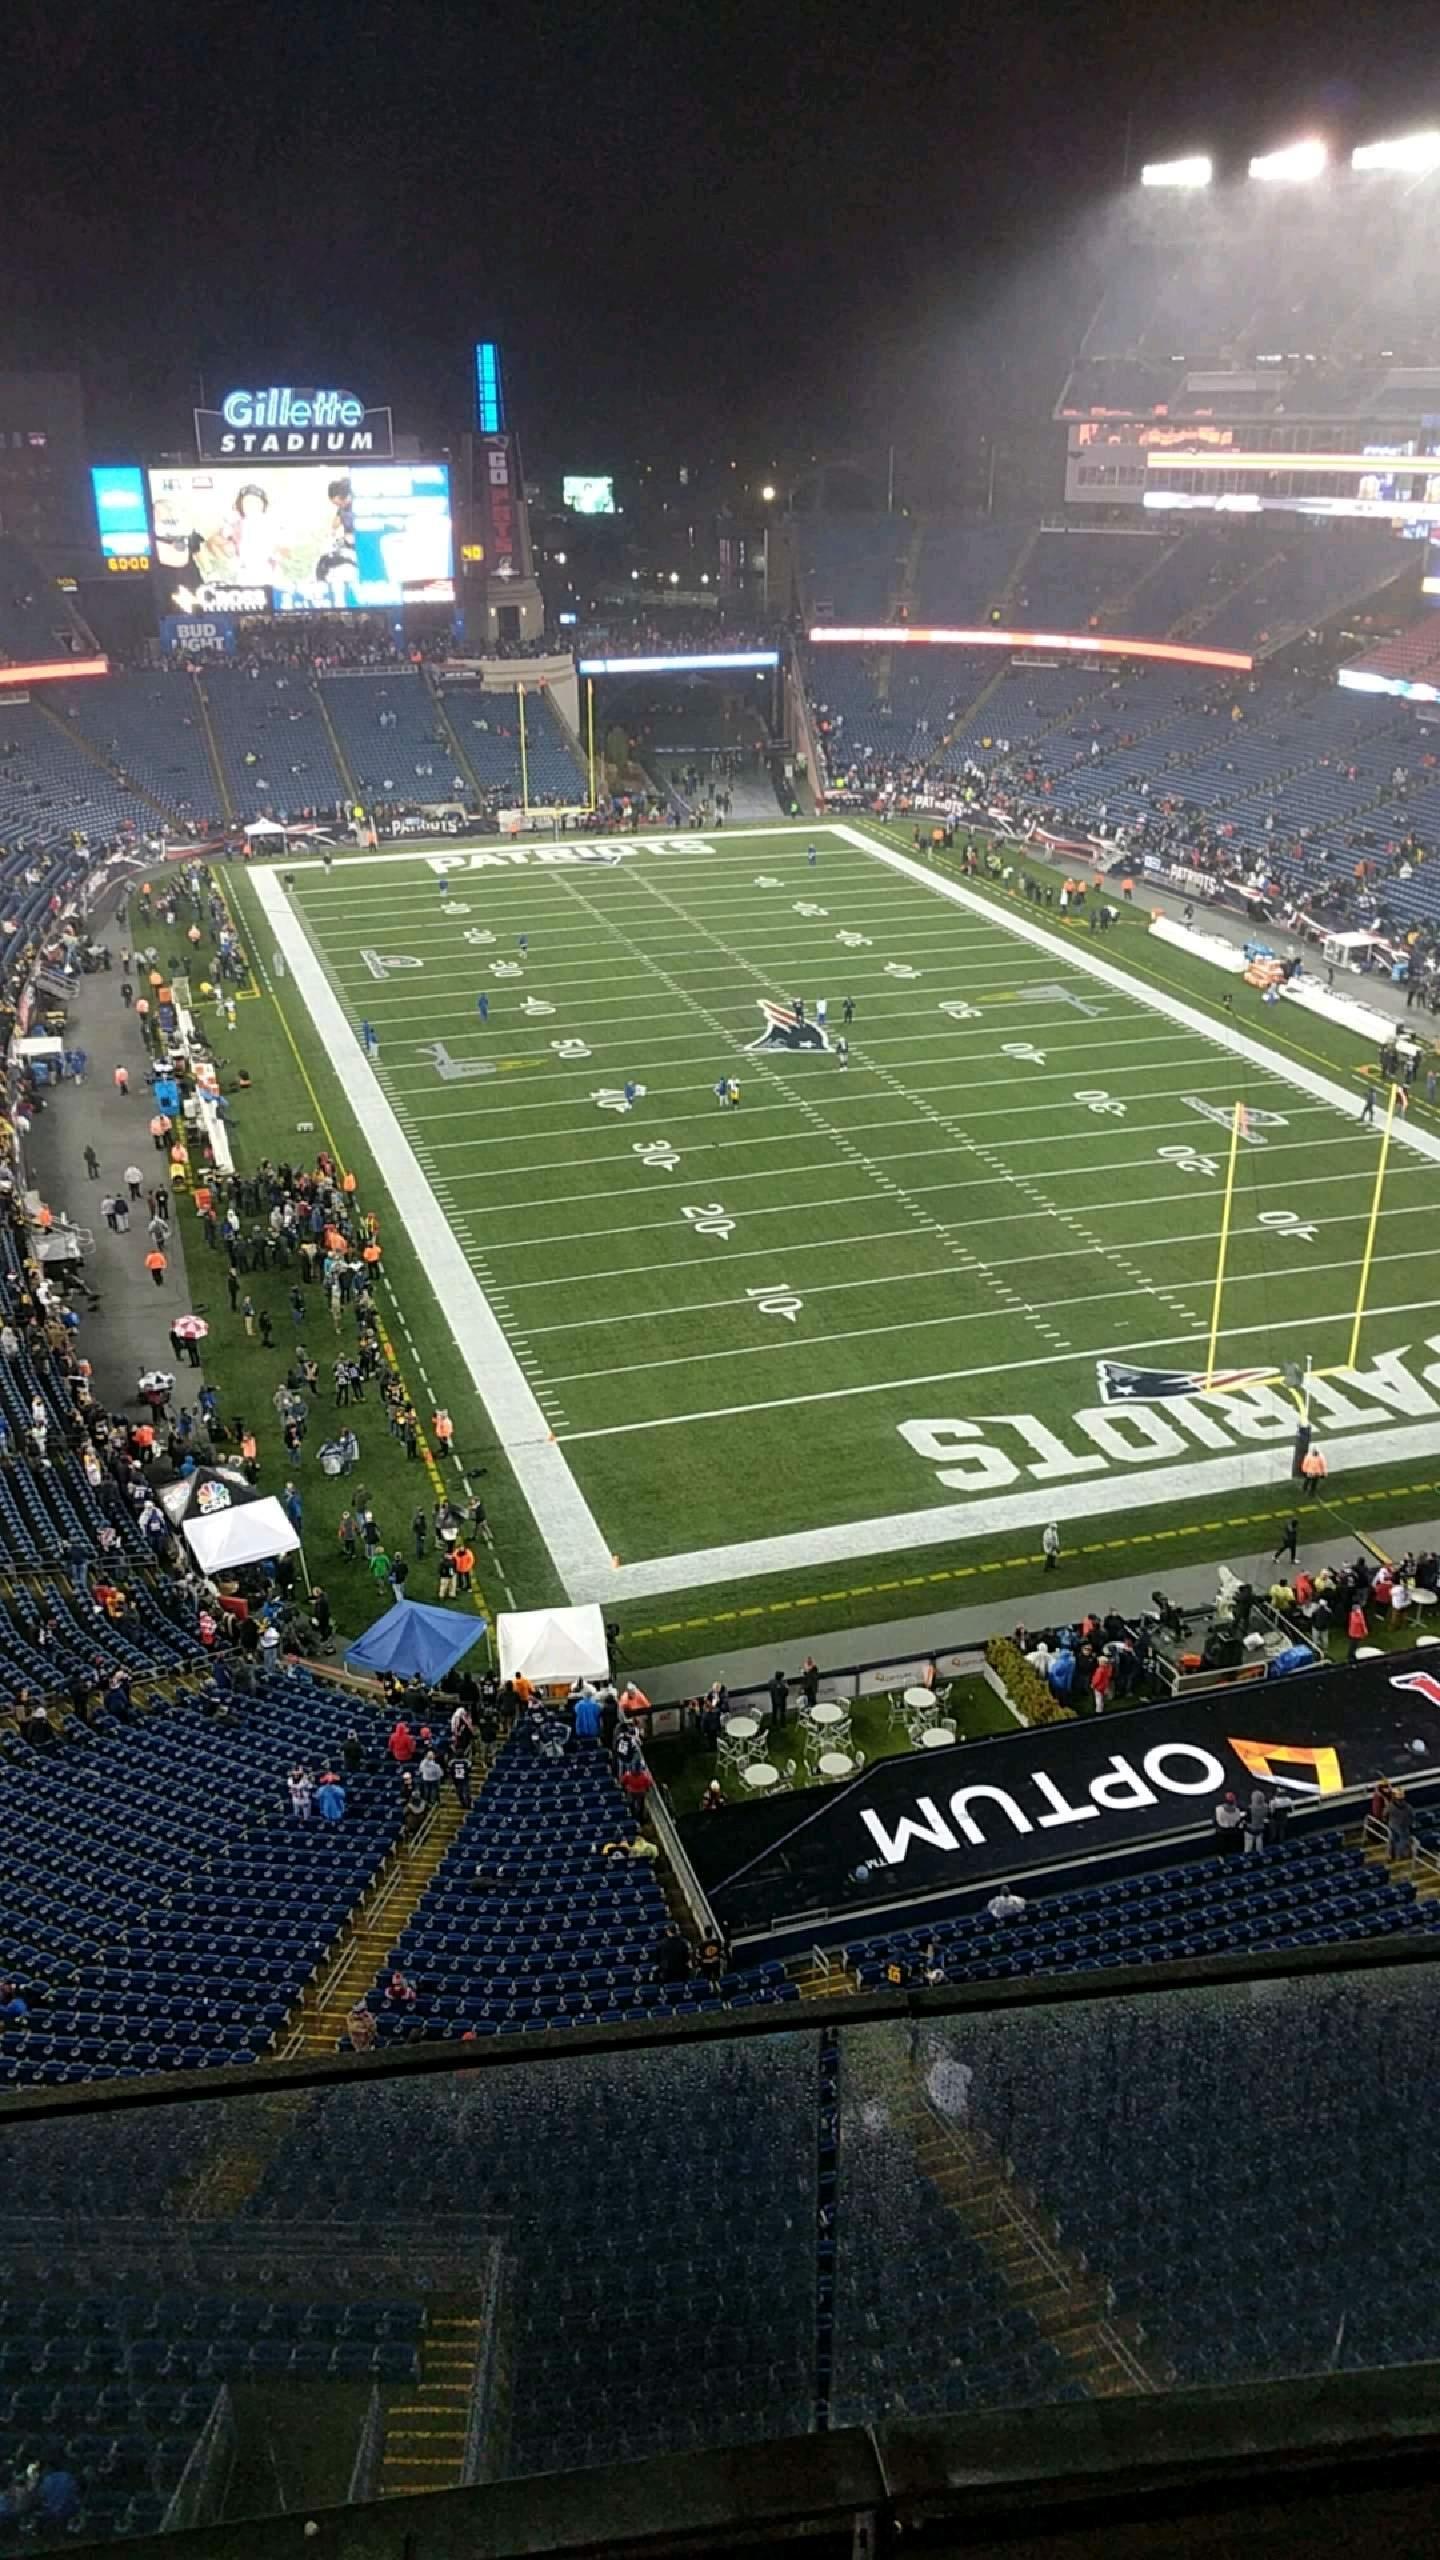 Gillette Stadium Section 319 Row 3 Seat 12